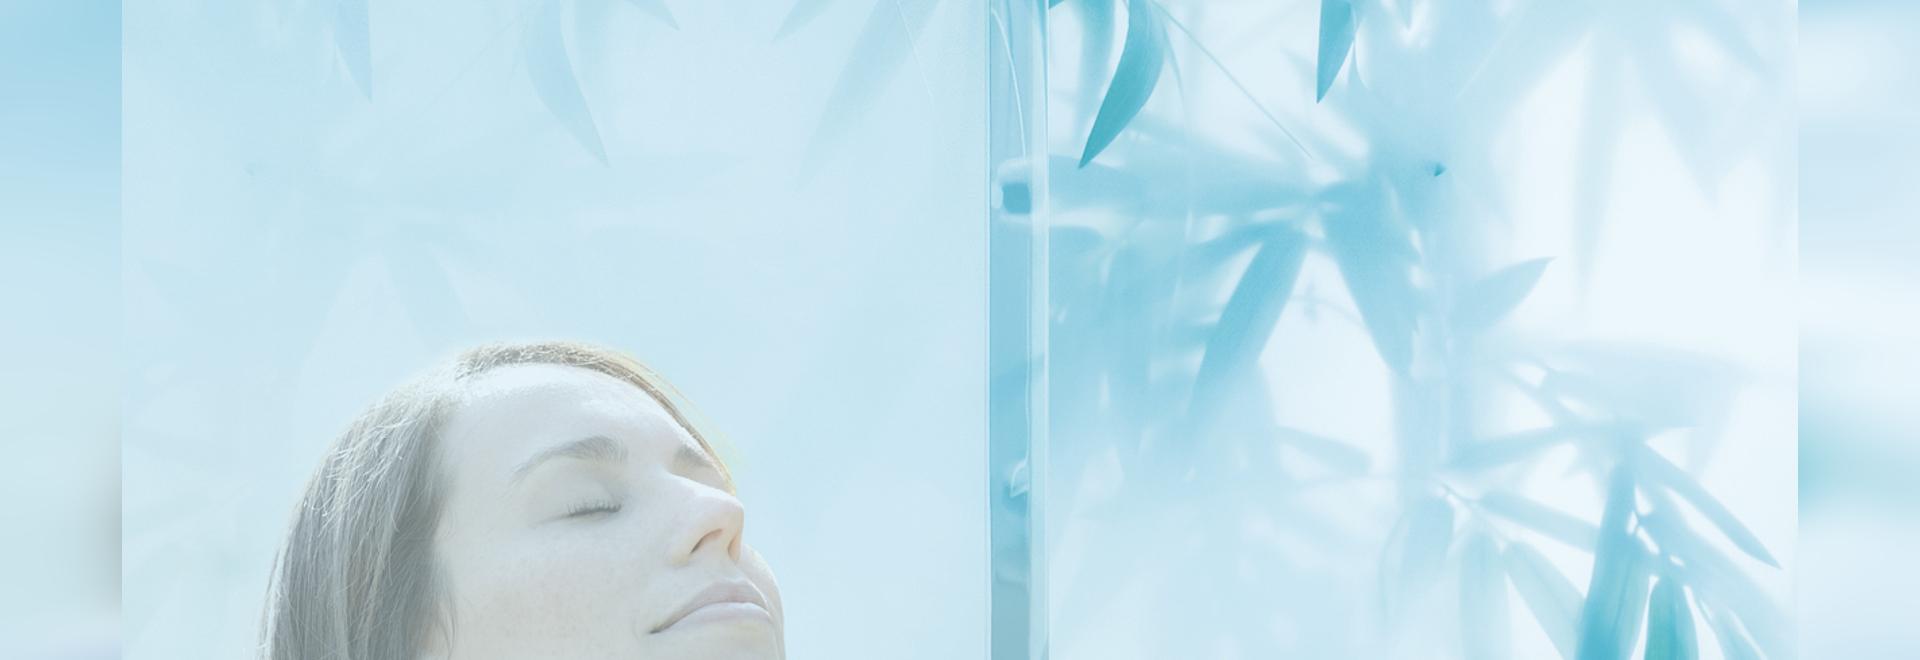 Litokol-Zherorisk-Technologie